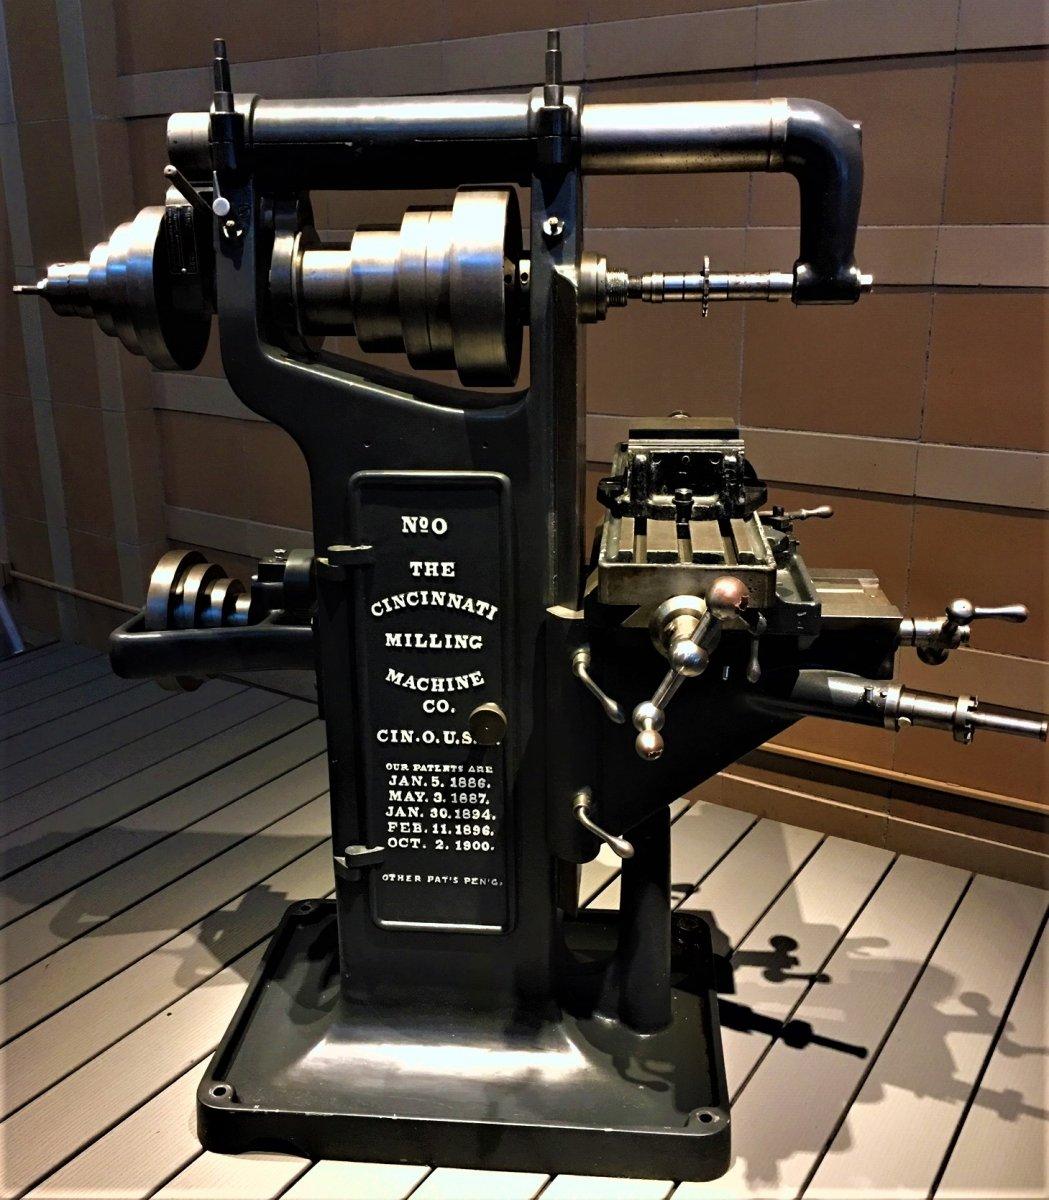 cinncinatti milling machine #0.JPG